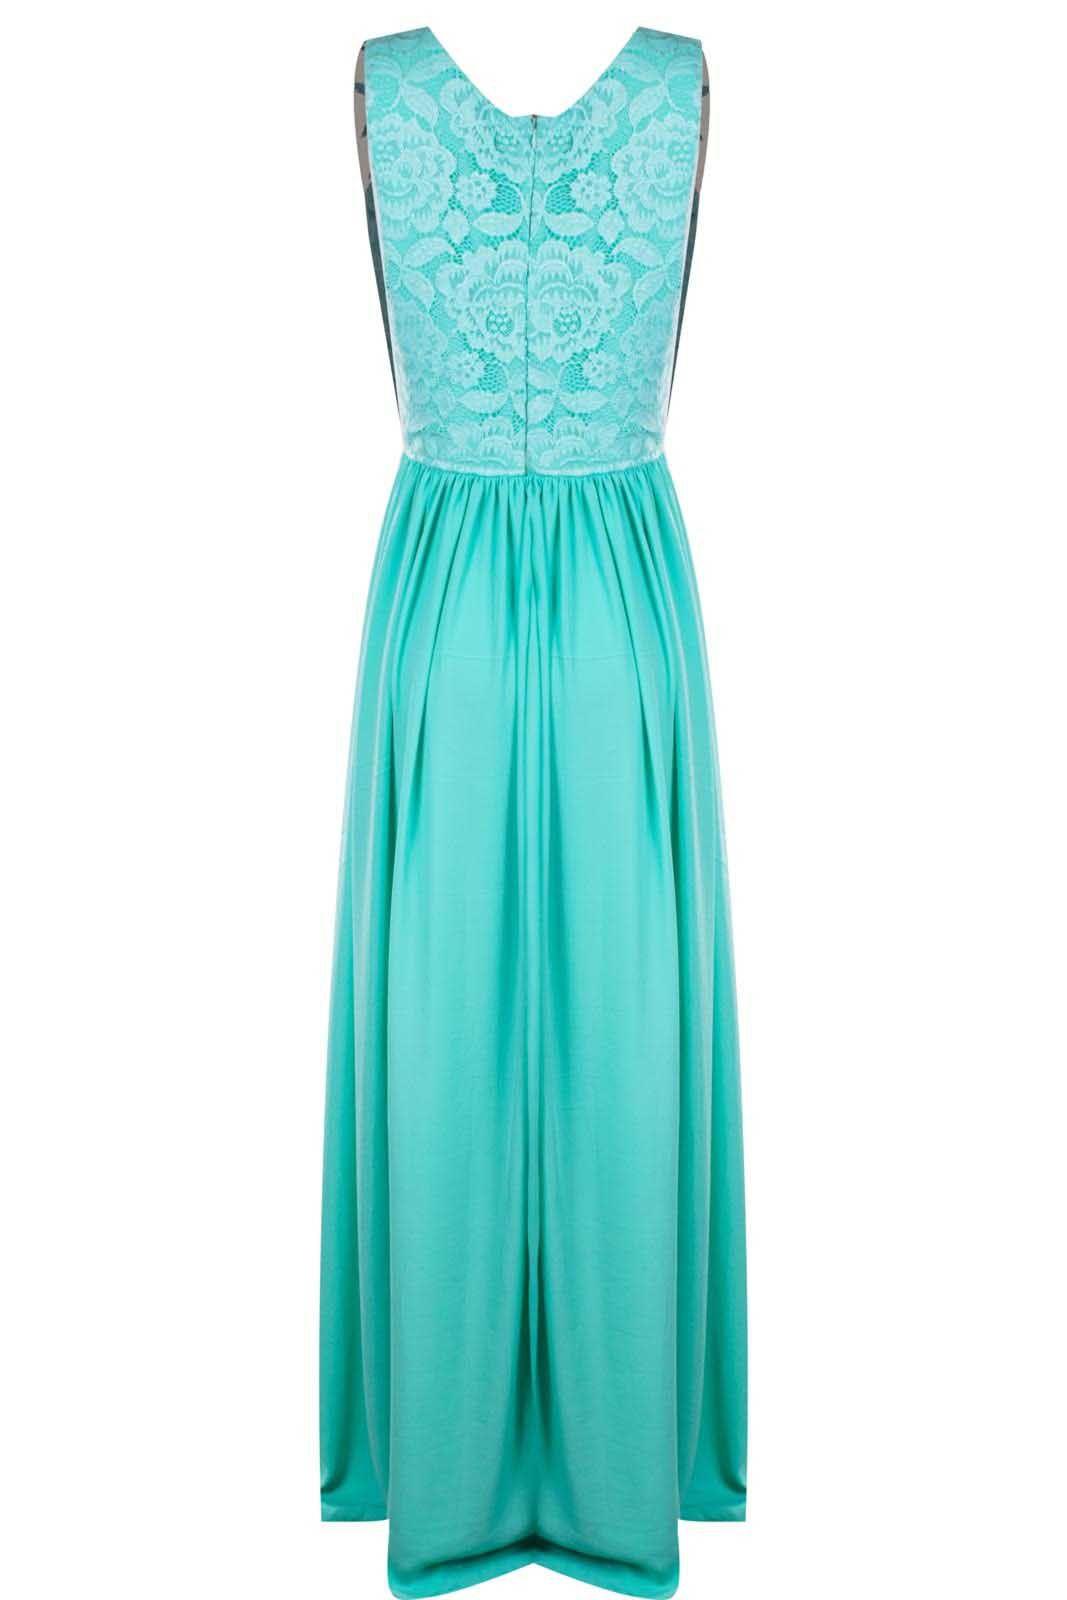 Vestido Outlet Dri Tubinho Festa Formatura Casamento Renda Forrada V Verde Tiffany